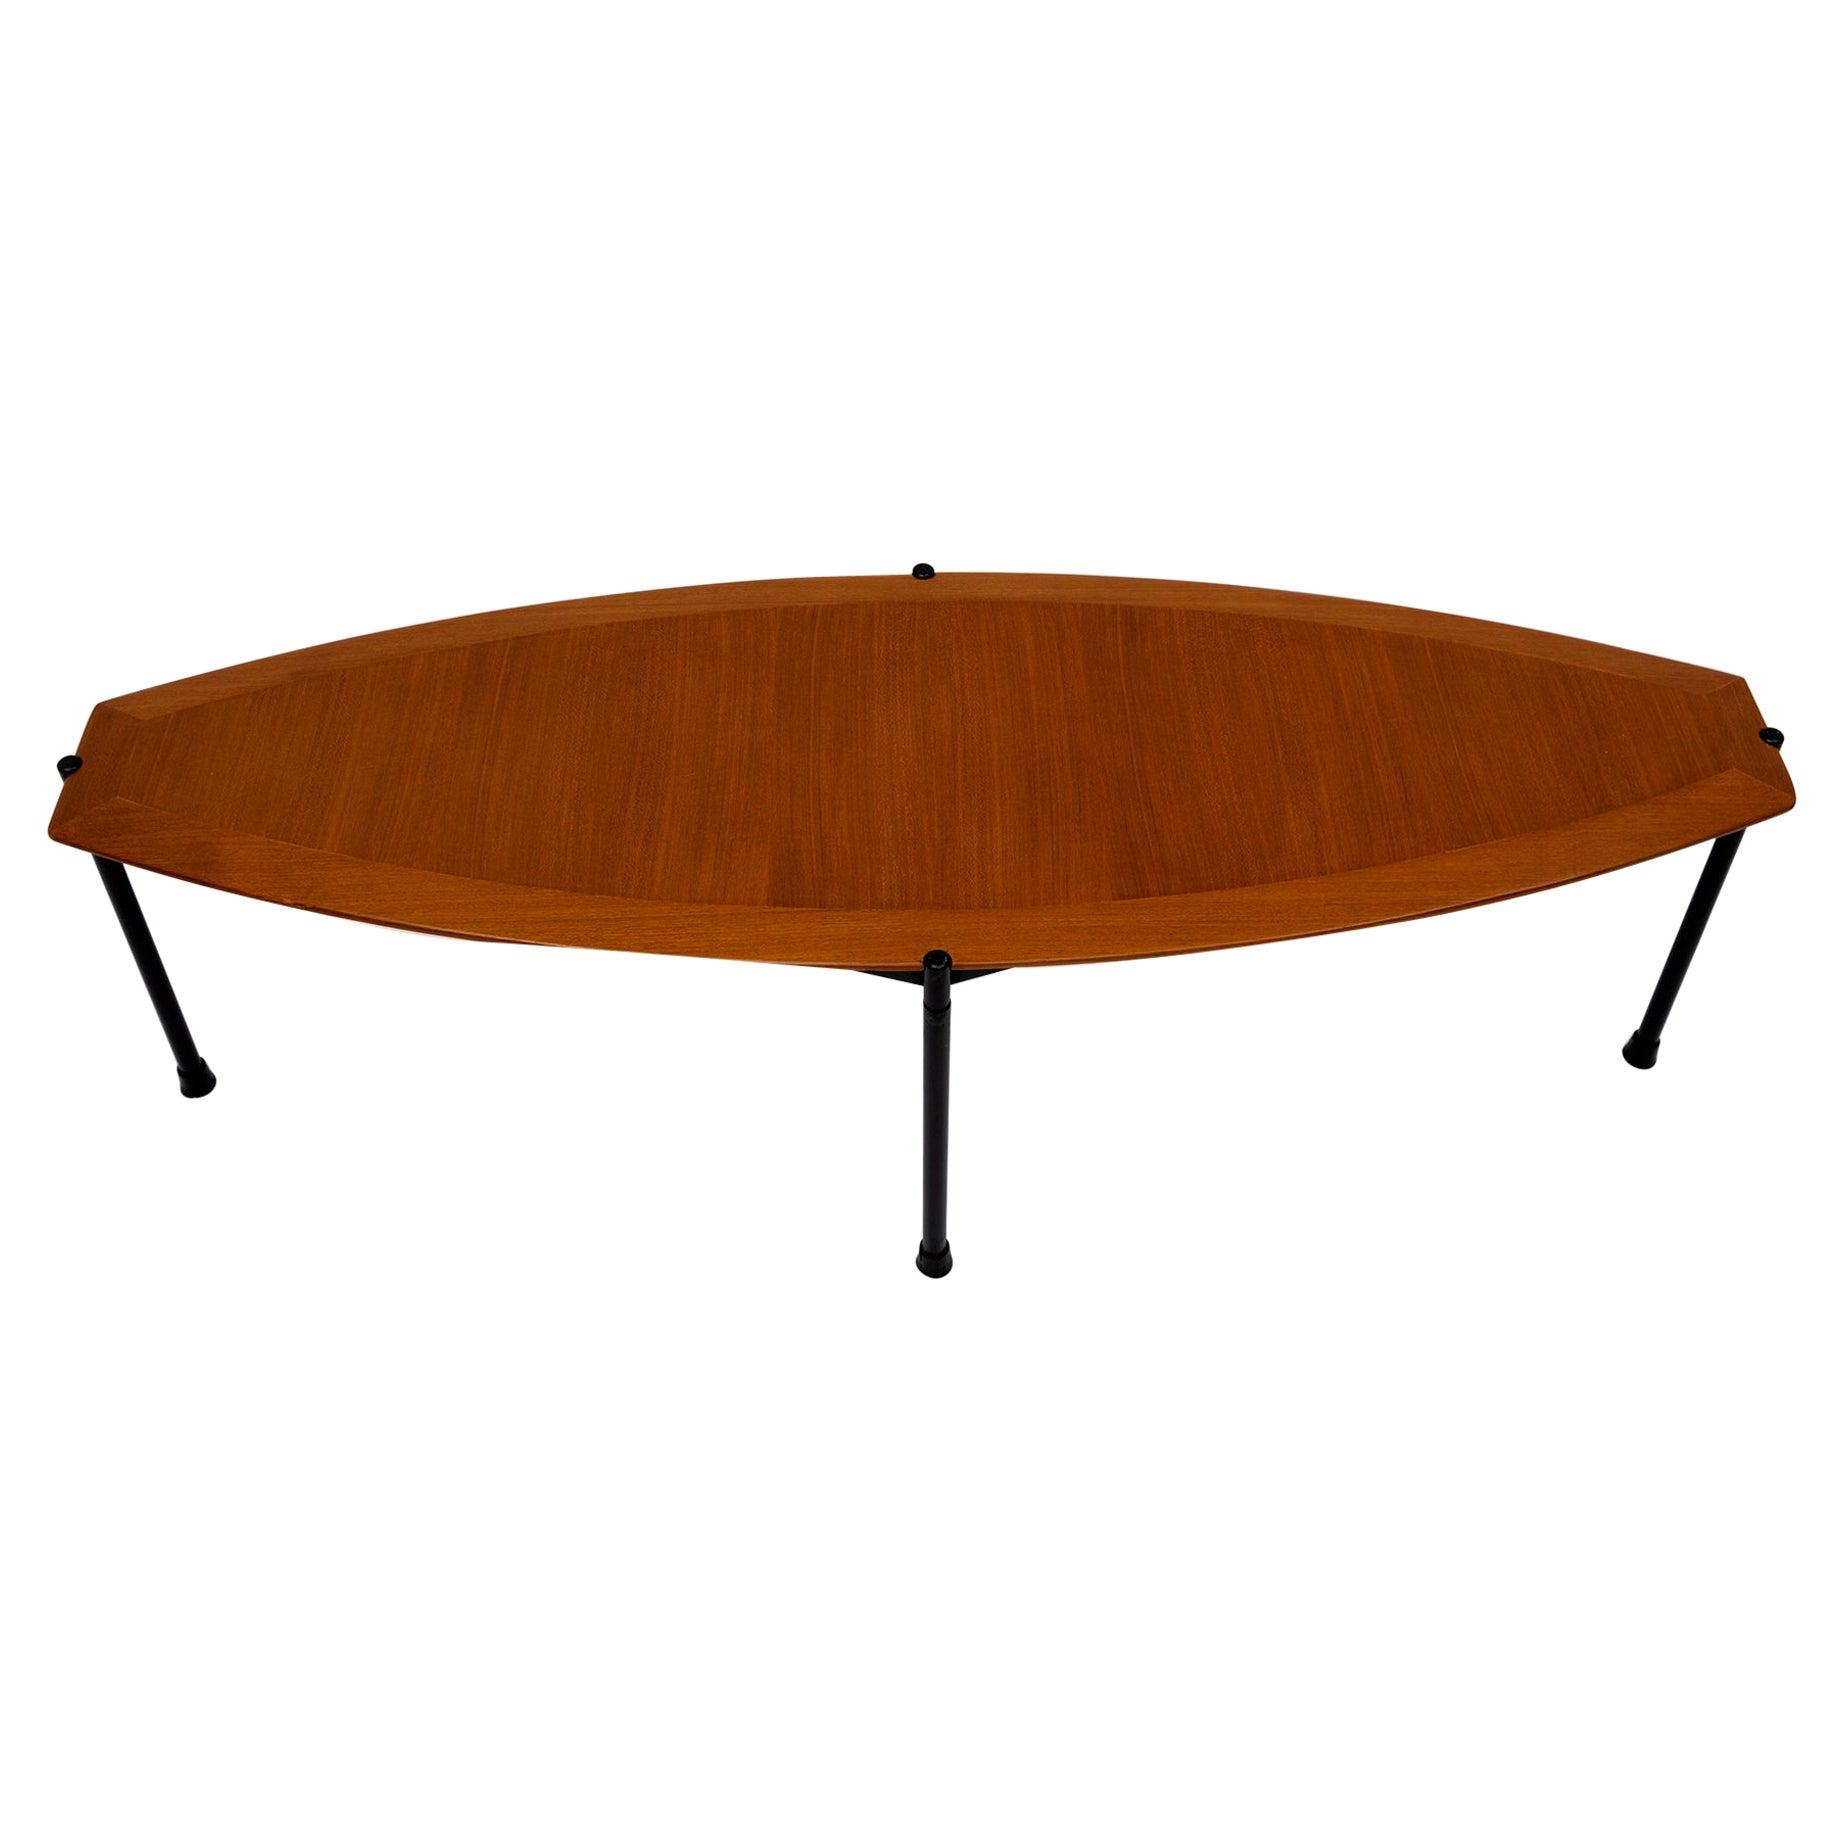 Mid-Century Modern Italian Surfboard Coffee Table, 1970s